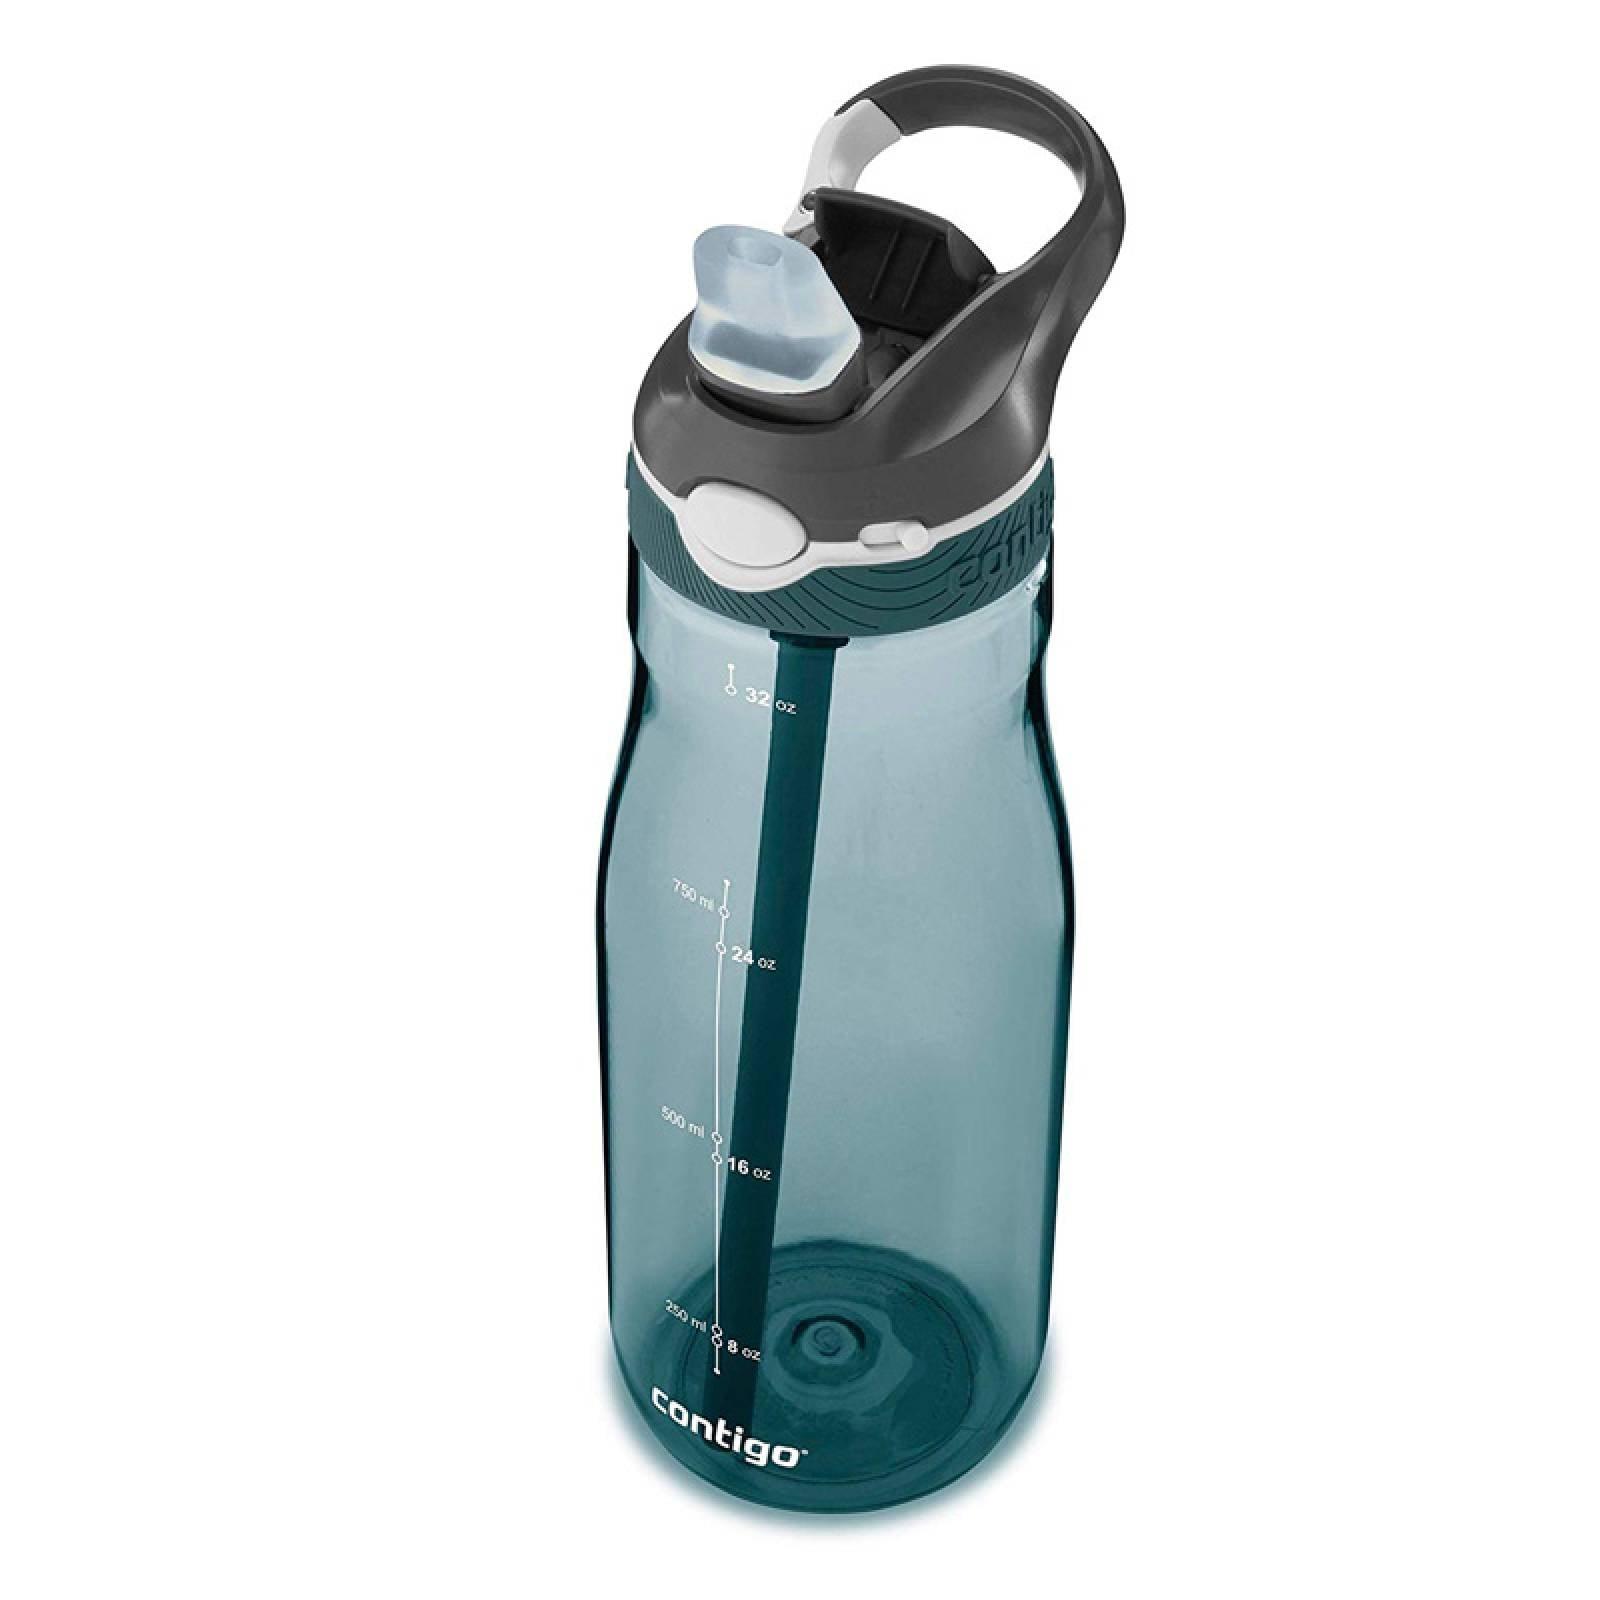 Botella Plastica 32 Oz Autospout Ashland Acelga Contigo